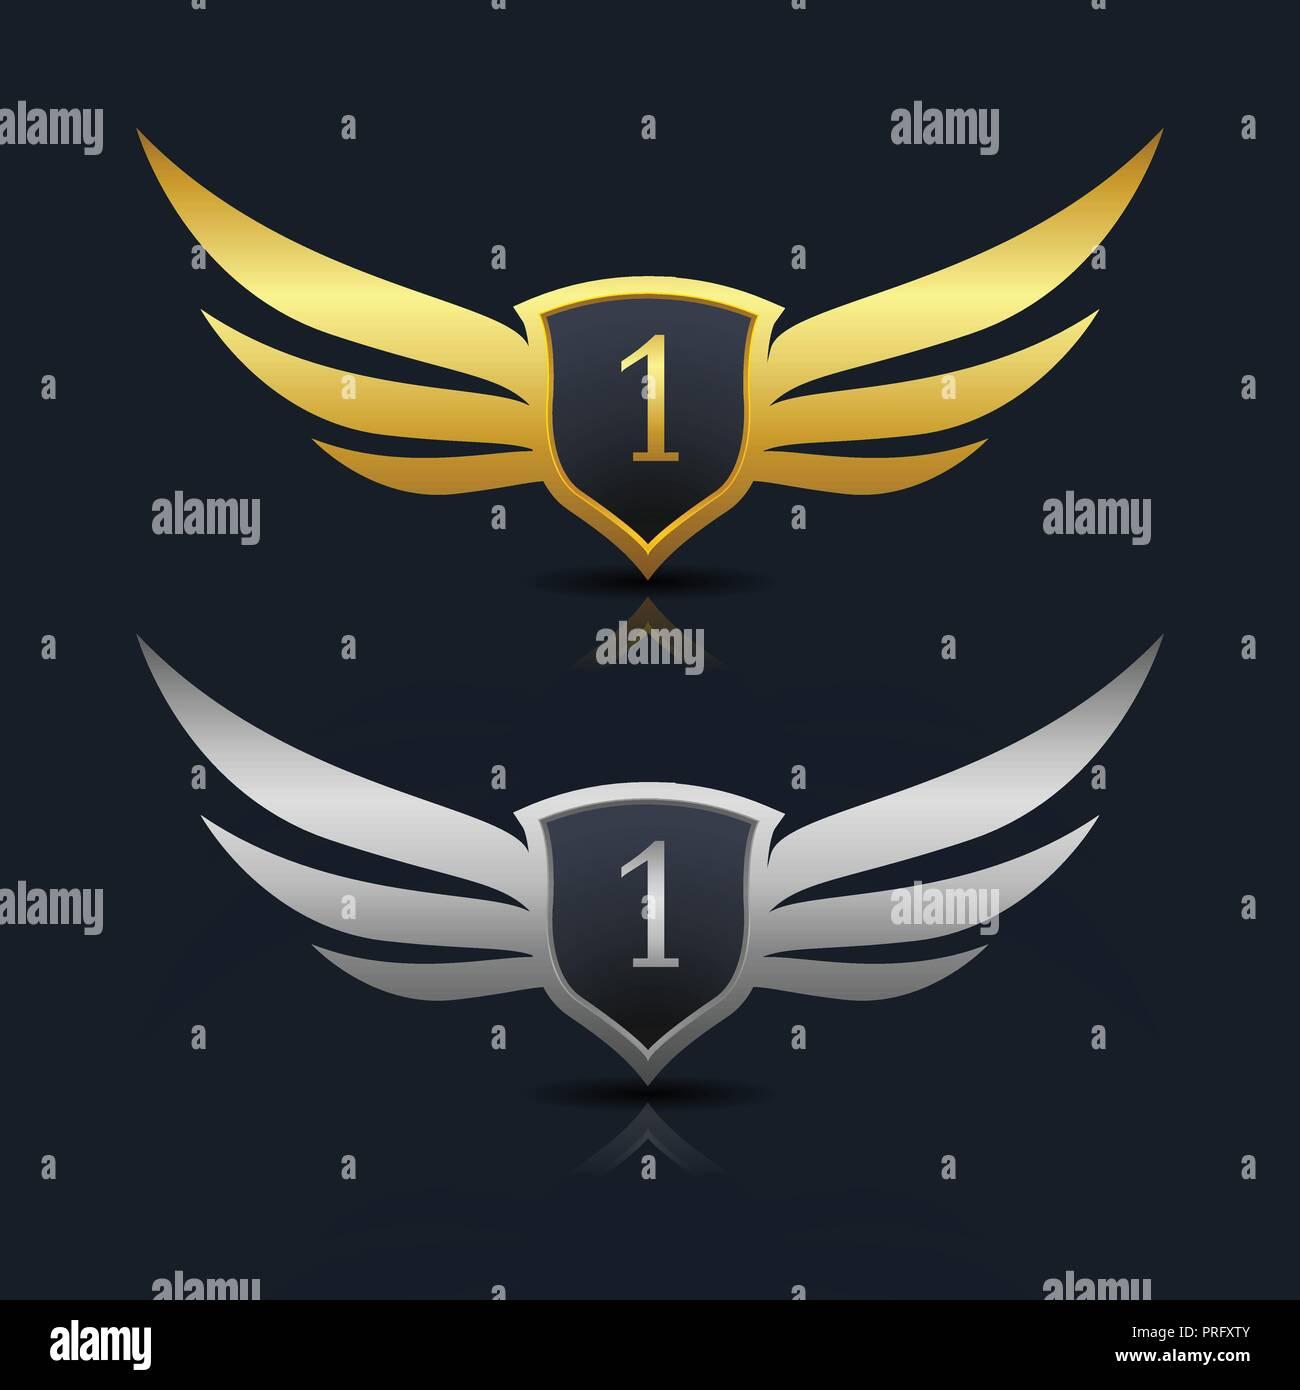 Escudo de alas número 1 Plantilla de logotipo Imagen De Stock